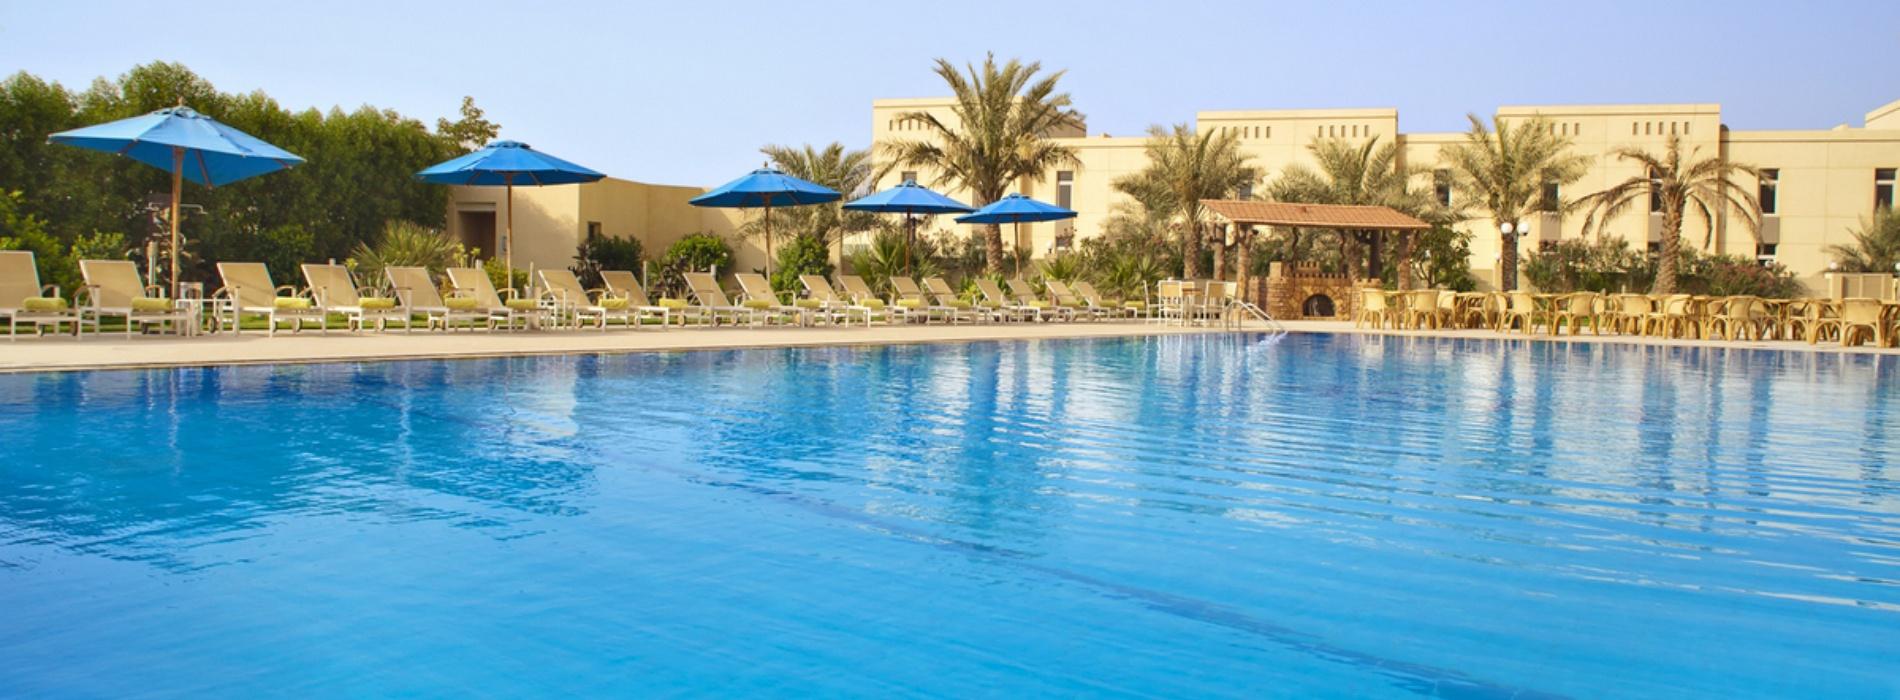 Beach Hotel Bin Majid Hotels & Resorts 4*